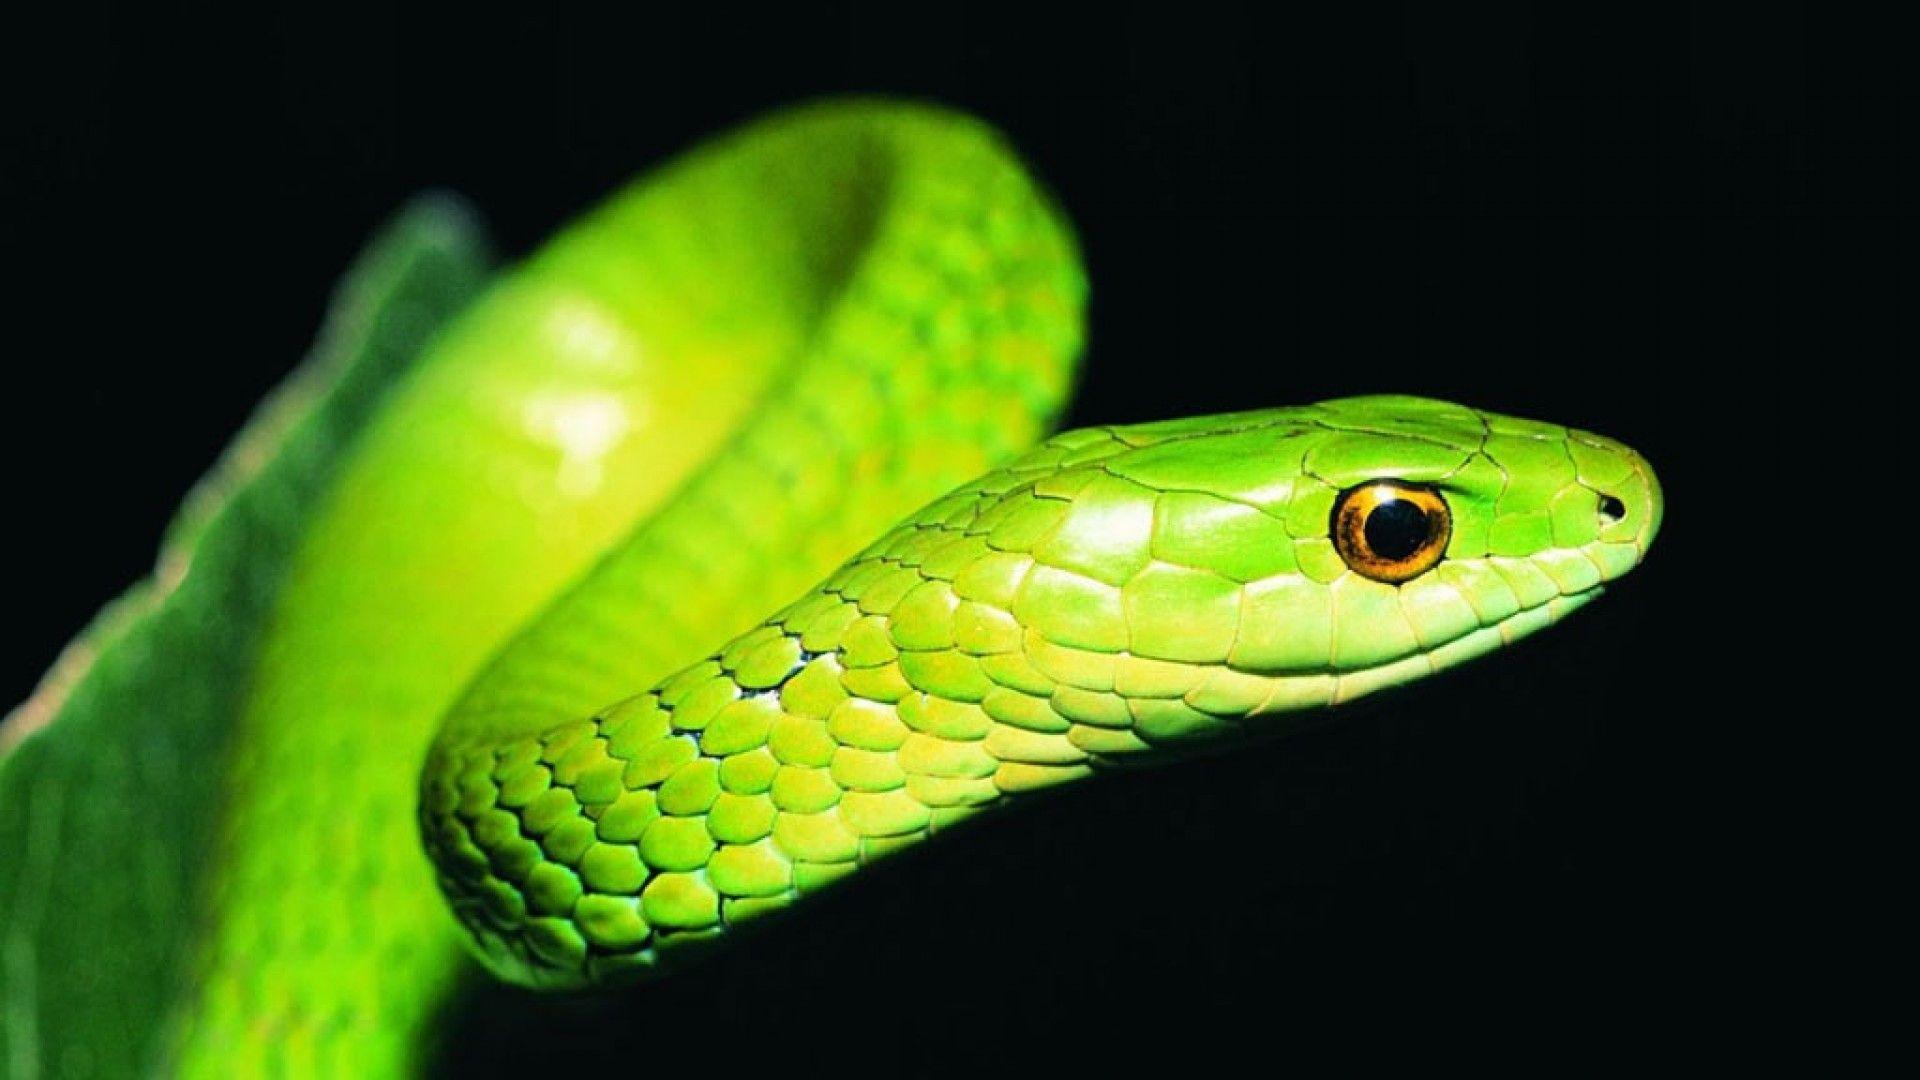 Bamboo Green Snake HD Black Wallpaper Tiere